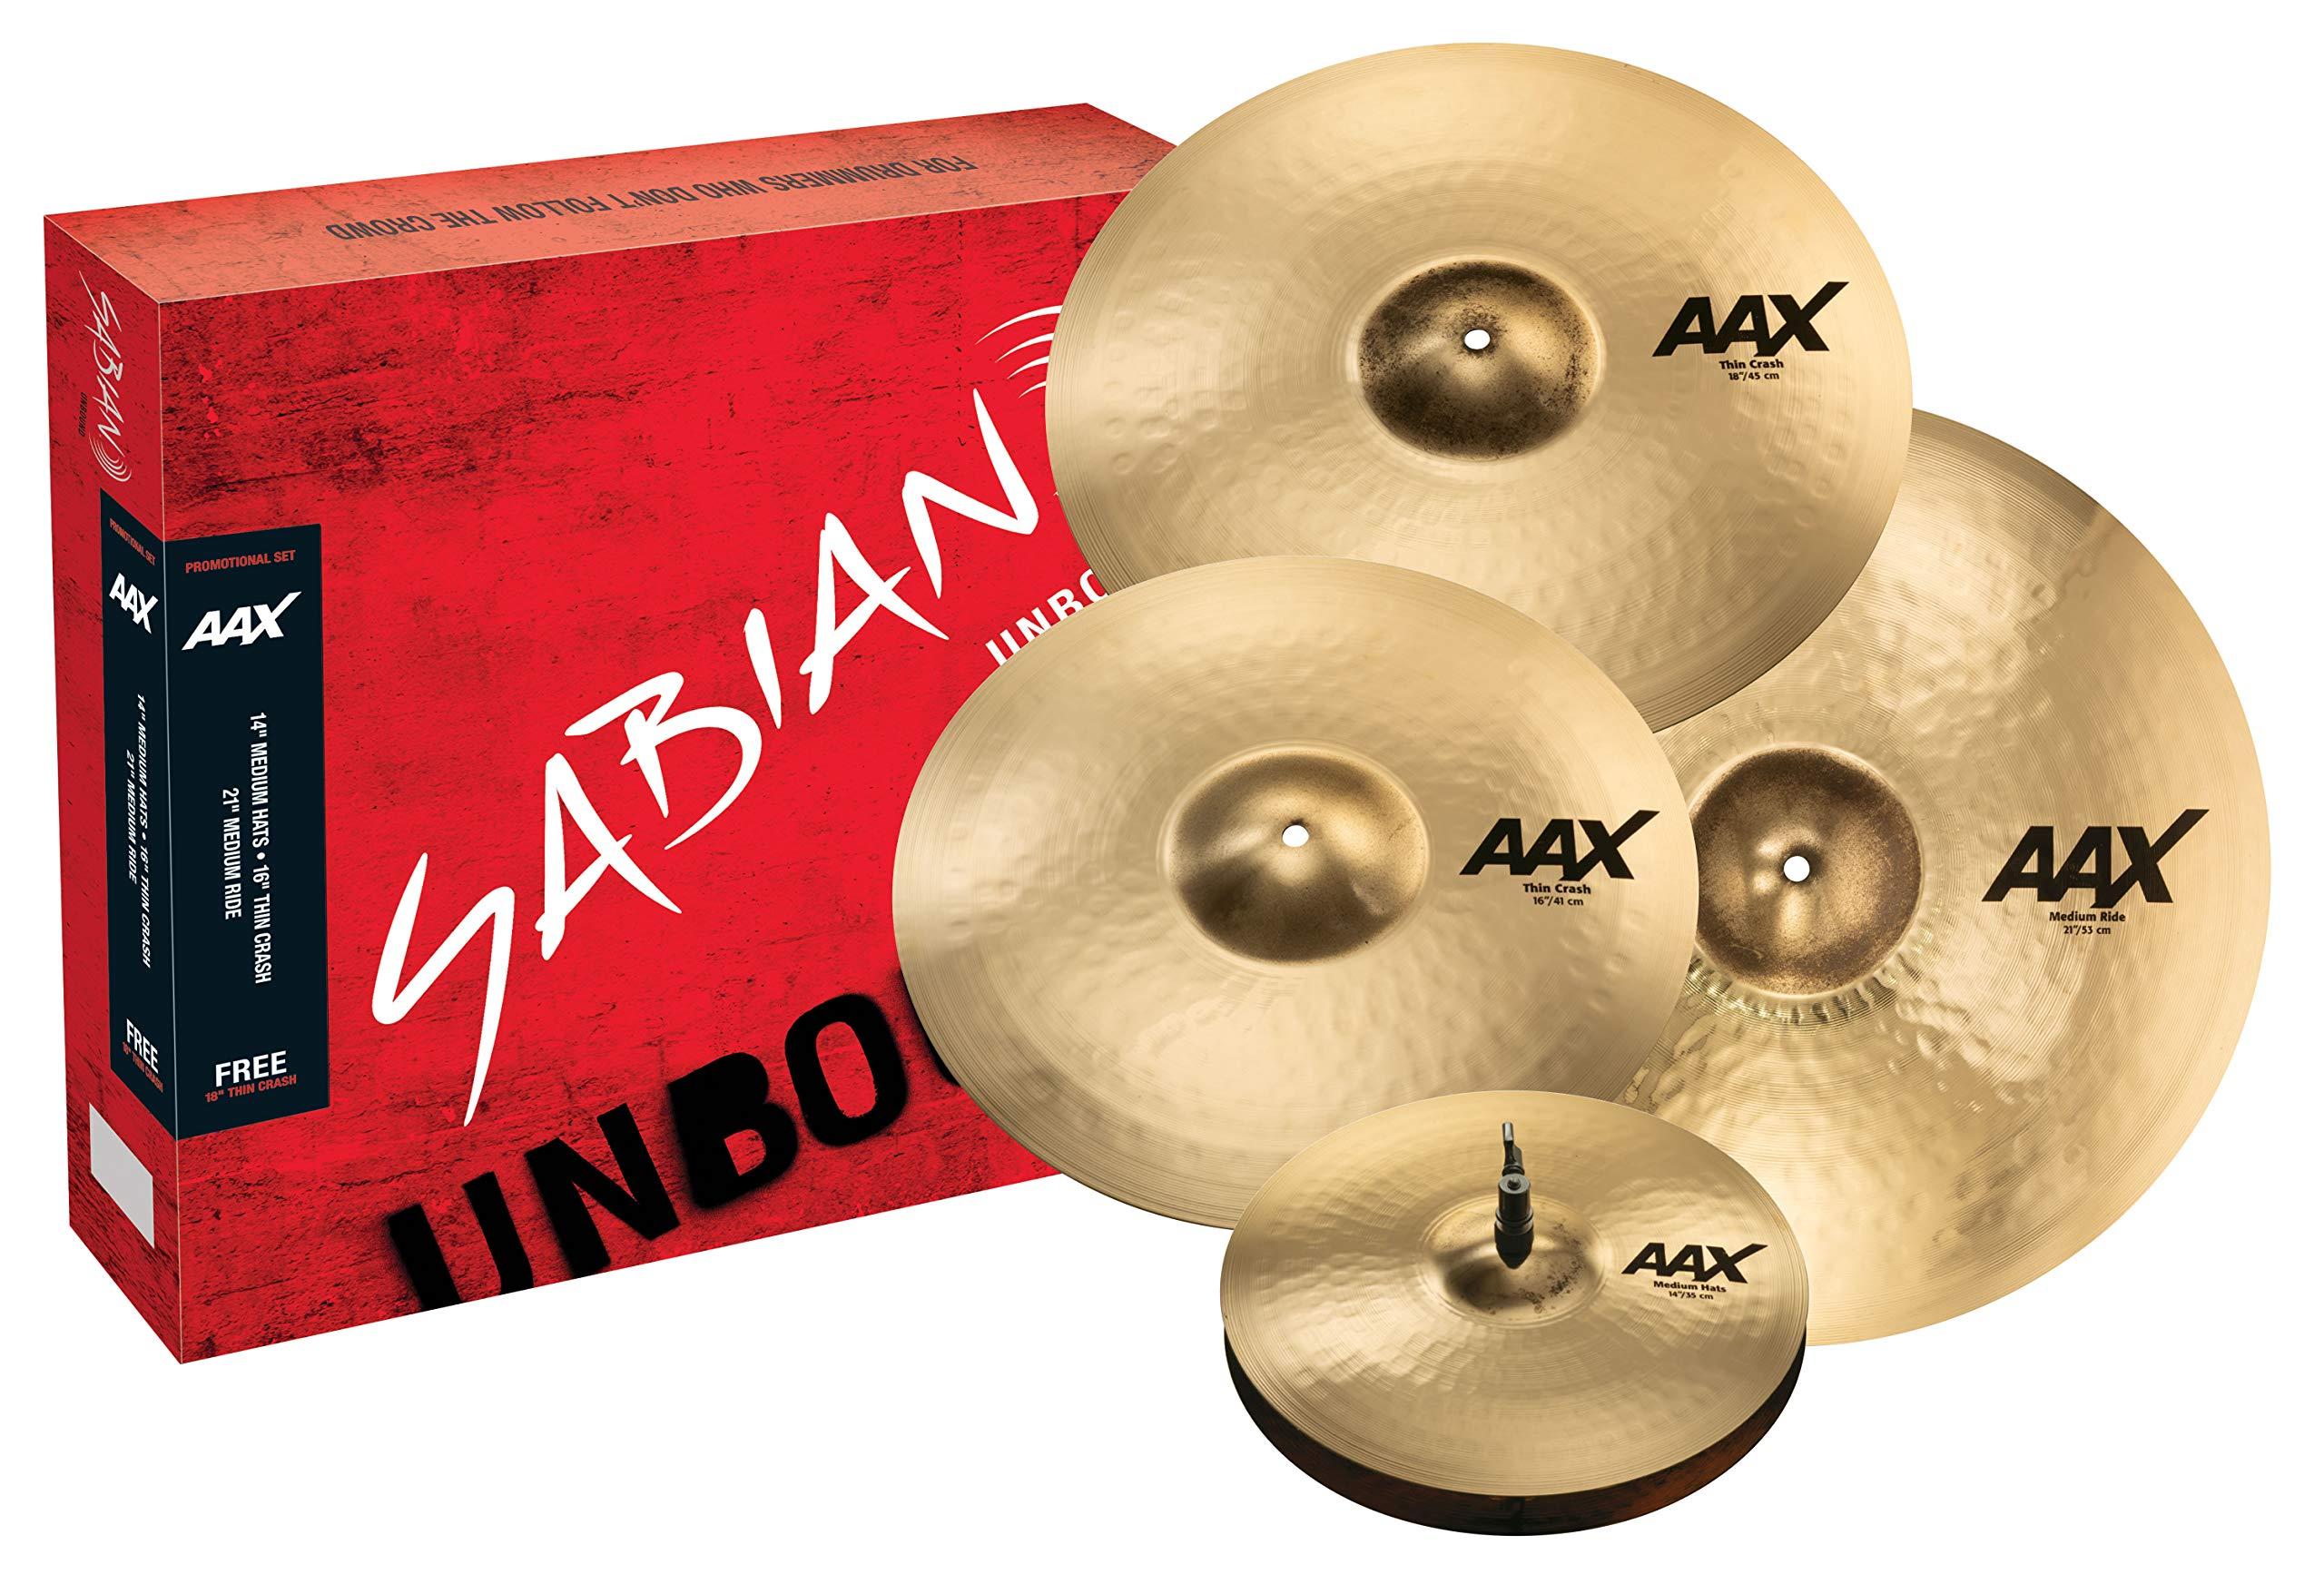 Sabian Cymbal Variety Package, AAX Promotional Set Brilliant Finish, ((14'' hats, 16'' Crash, 21'' Ride, Free 18'' Crash) (25005XCPB) by Sabian